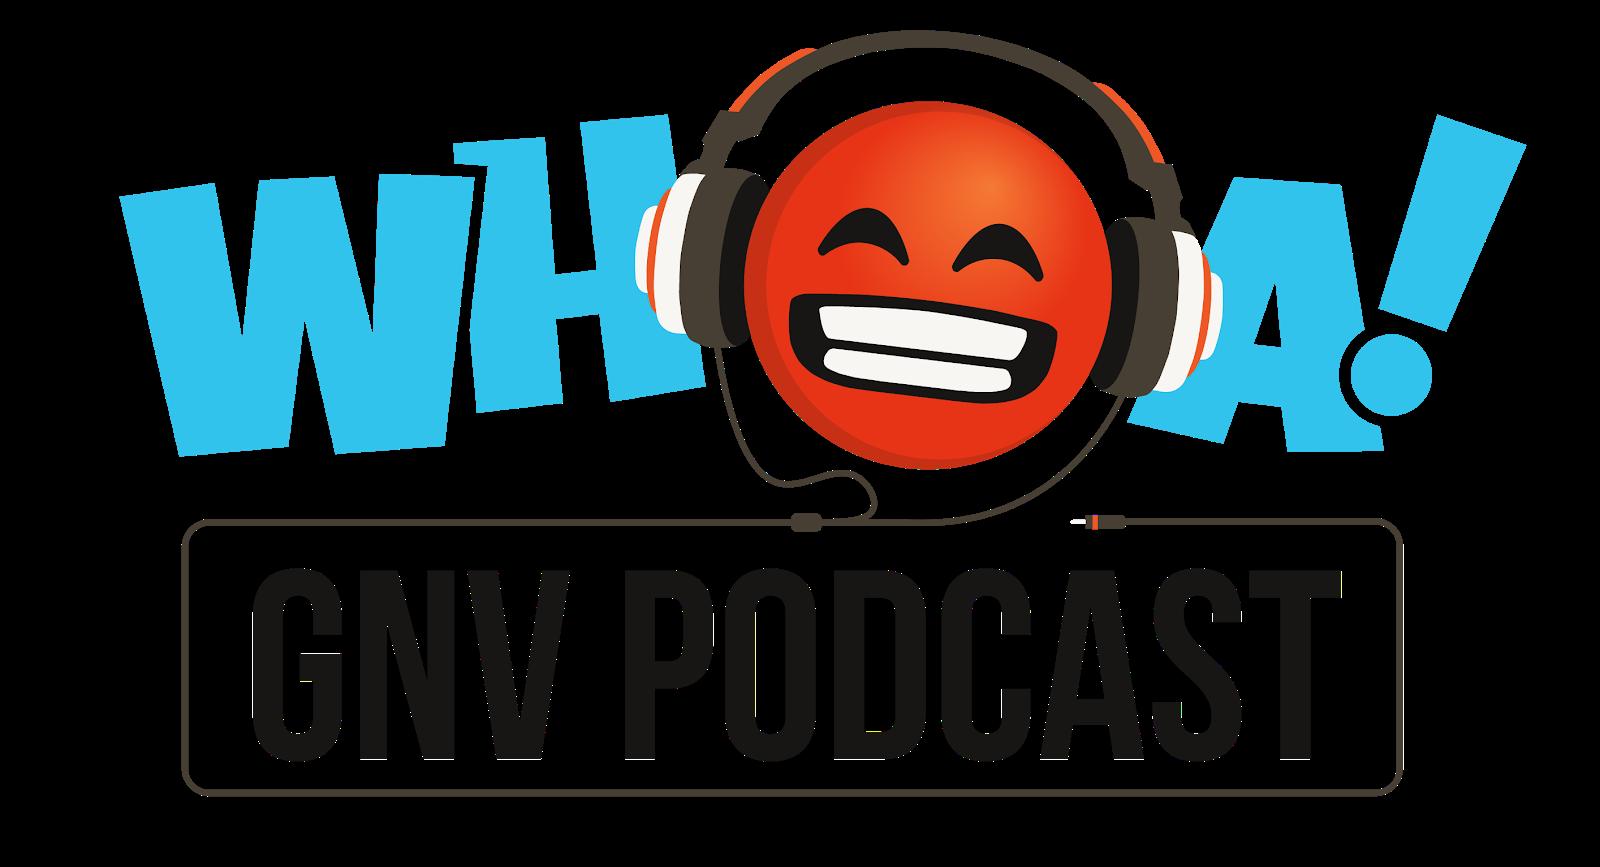 WHOA GNV logo